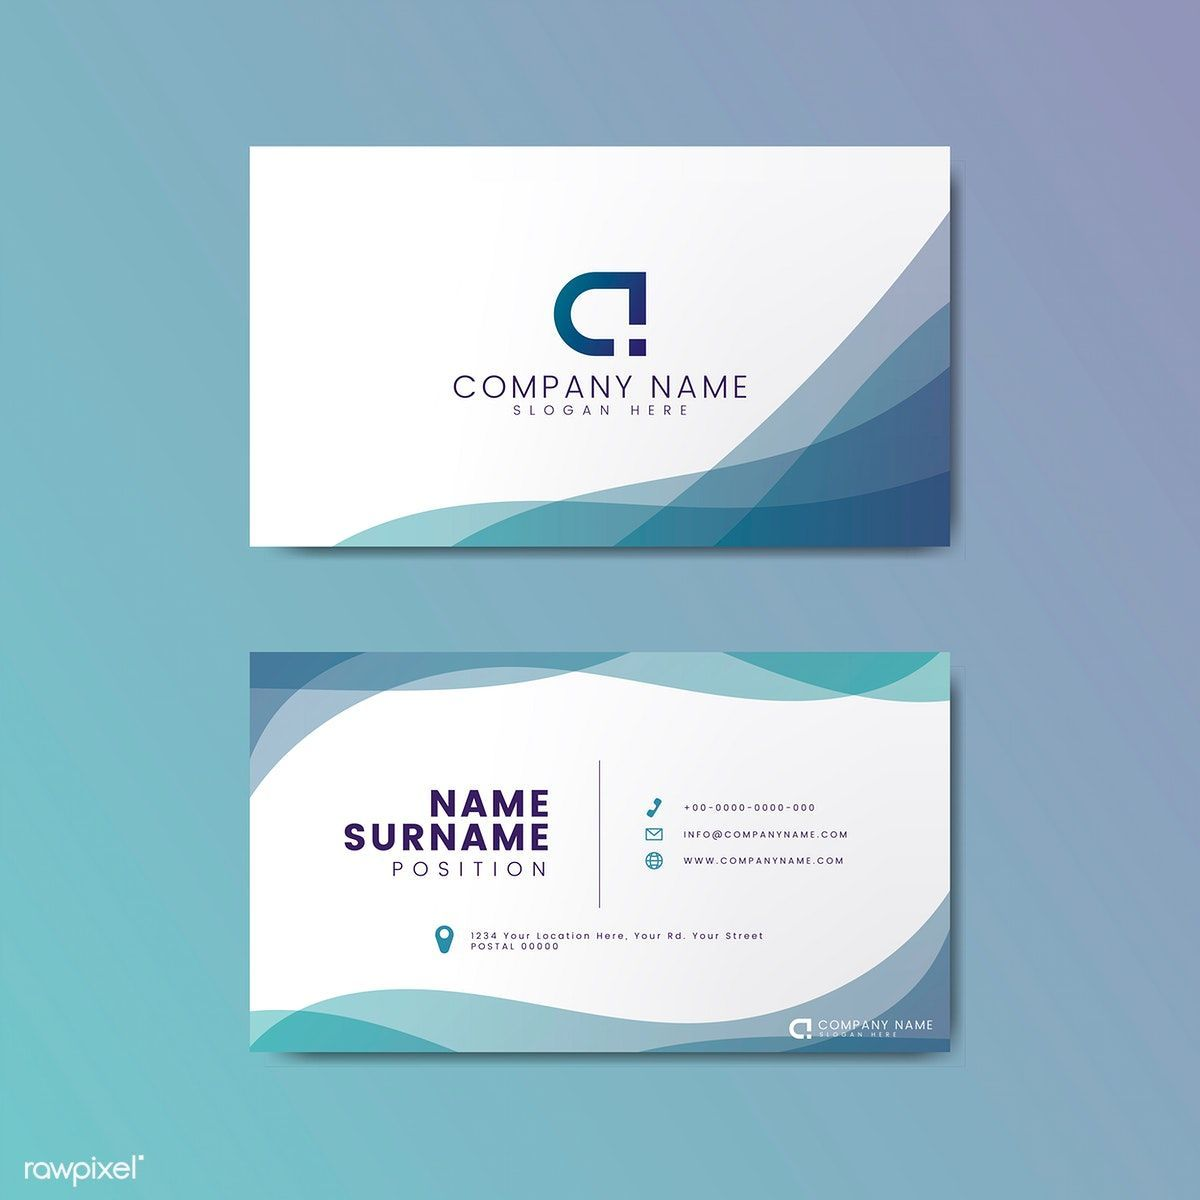 The Mesmerizing Modern Geometric Business Card Design Free Image Regarding Callin Business Card Design Minimal Free Business Card Design Business Card Design